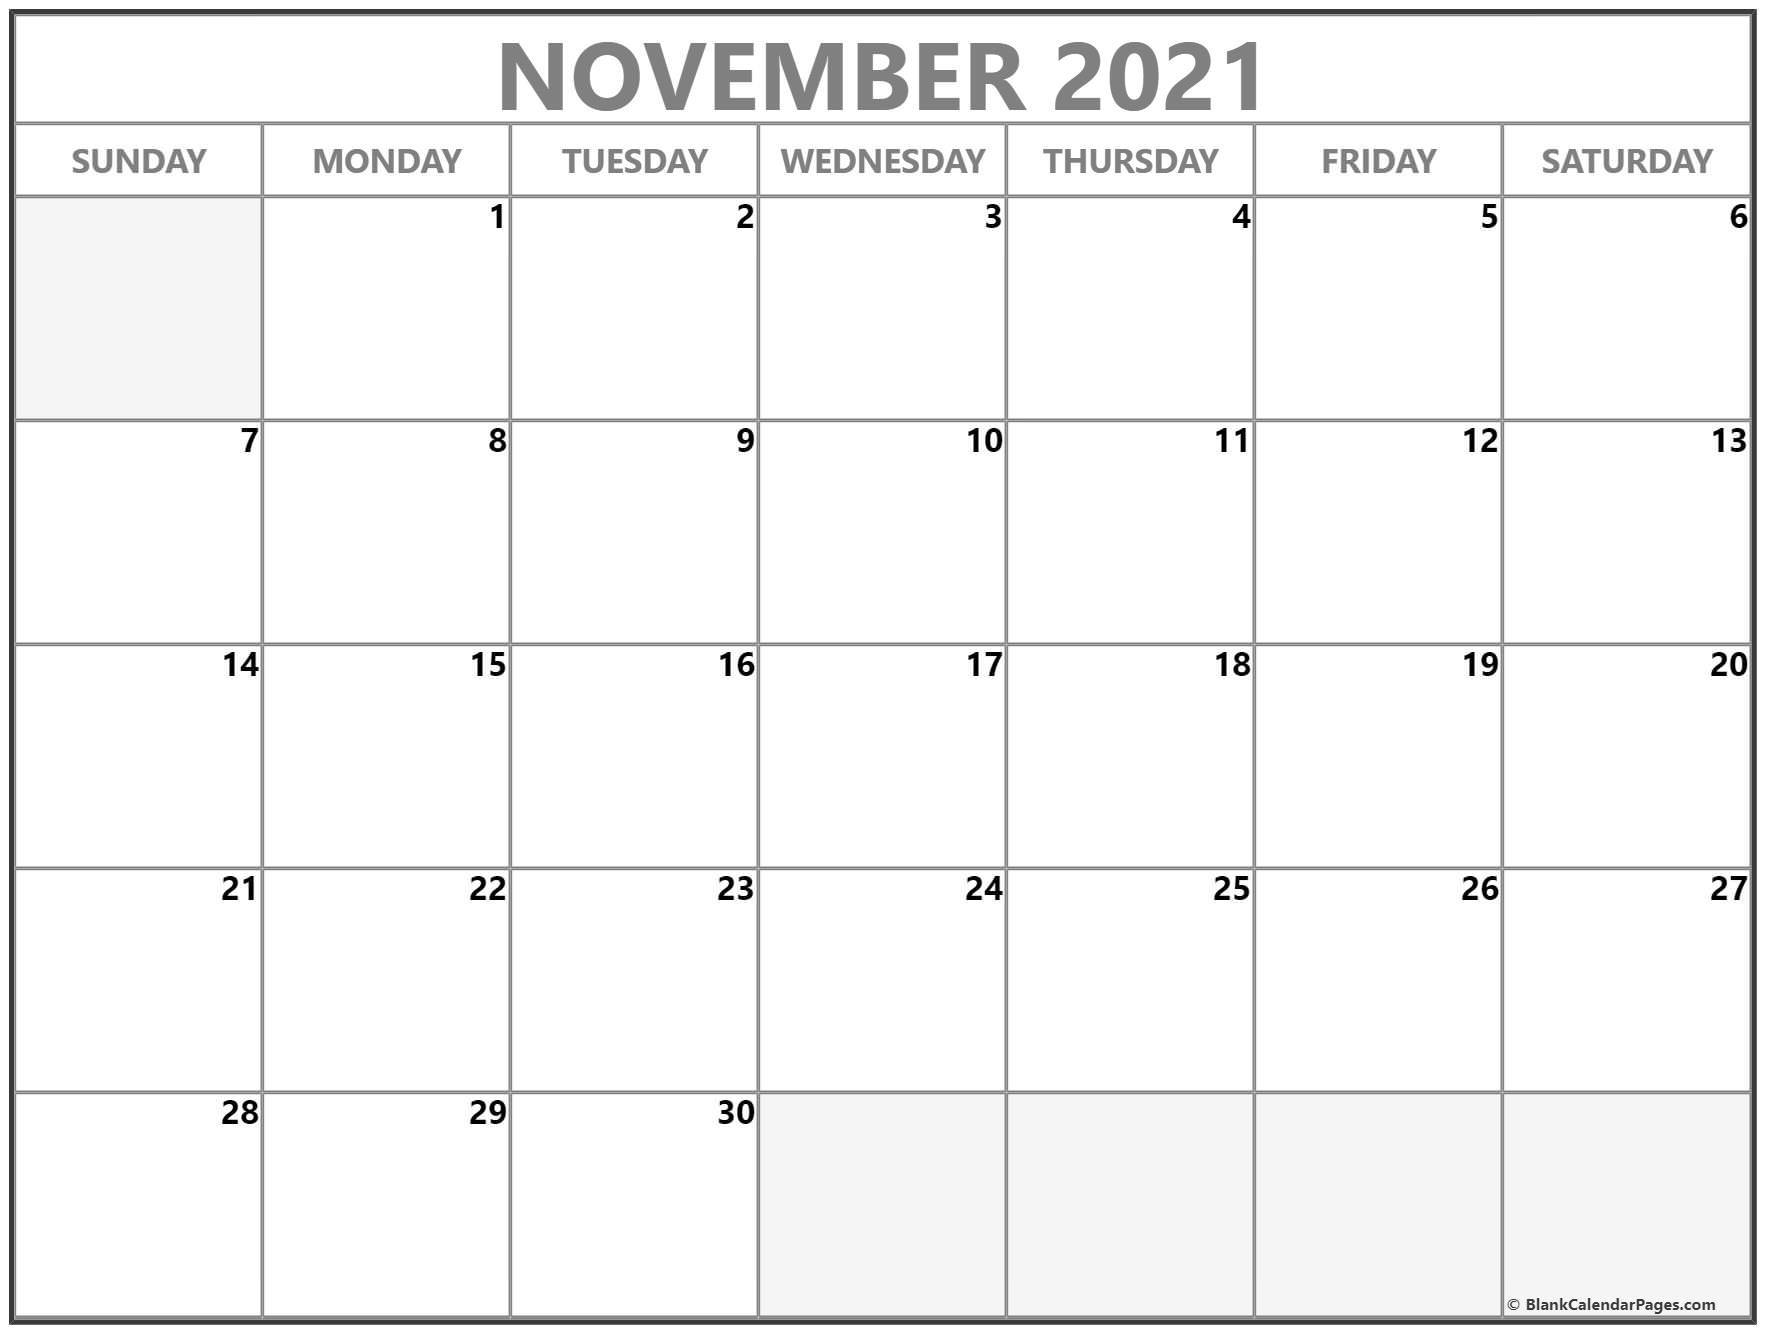 November 2021 Calendar | Free Printable Monthly Calendars-November 2021 Fill In Calendar